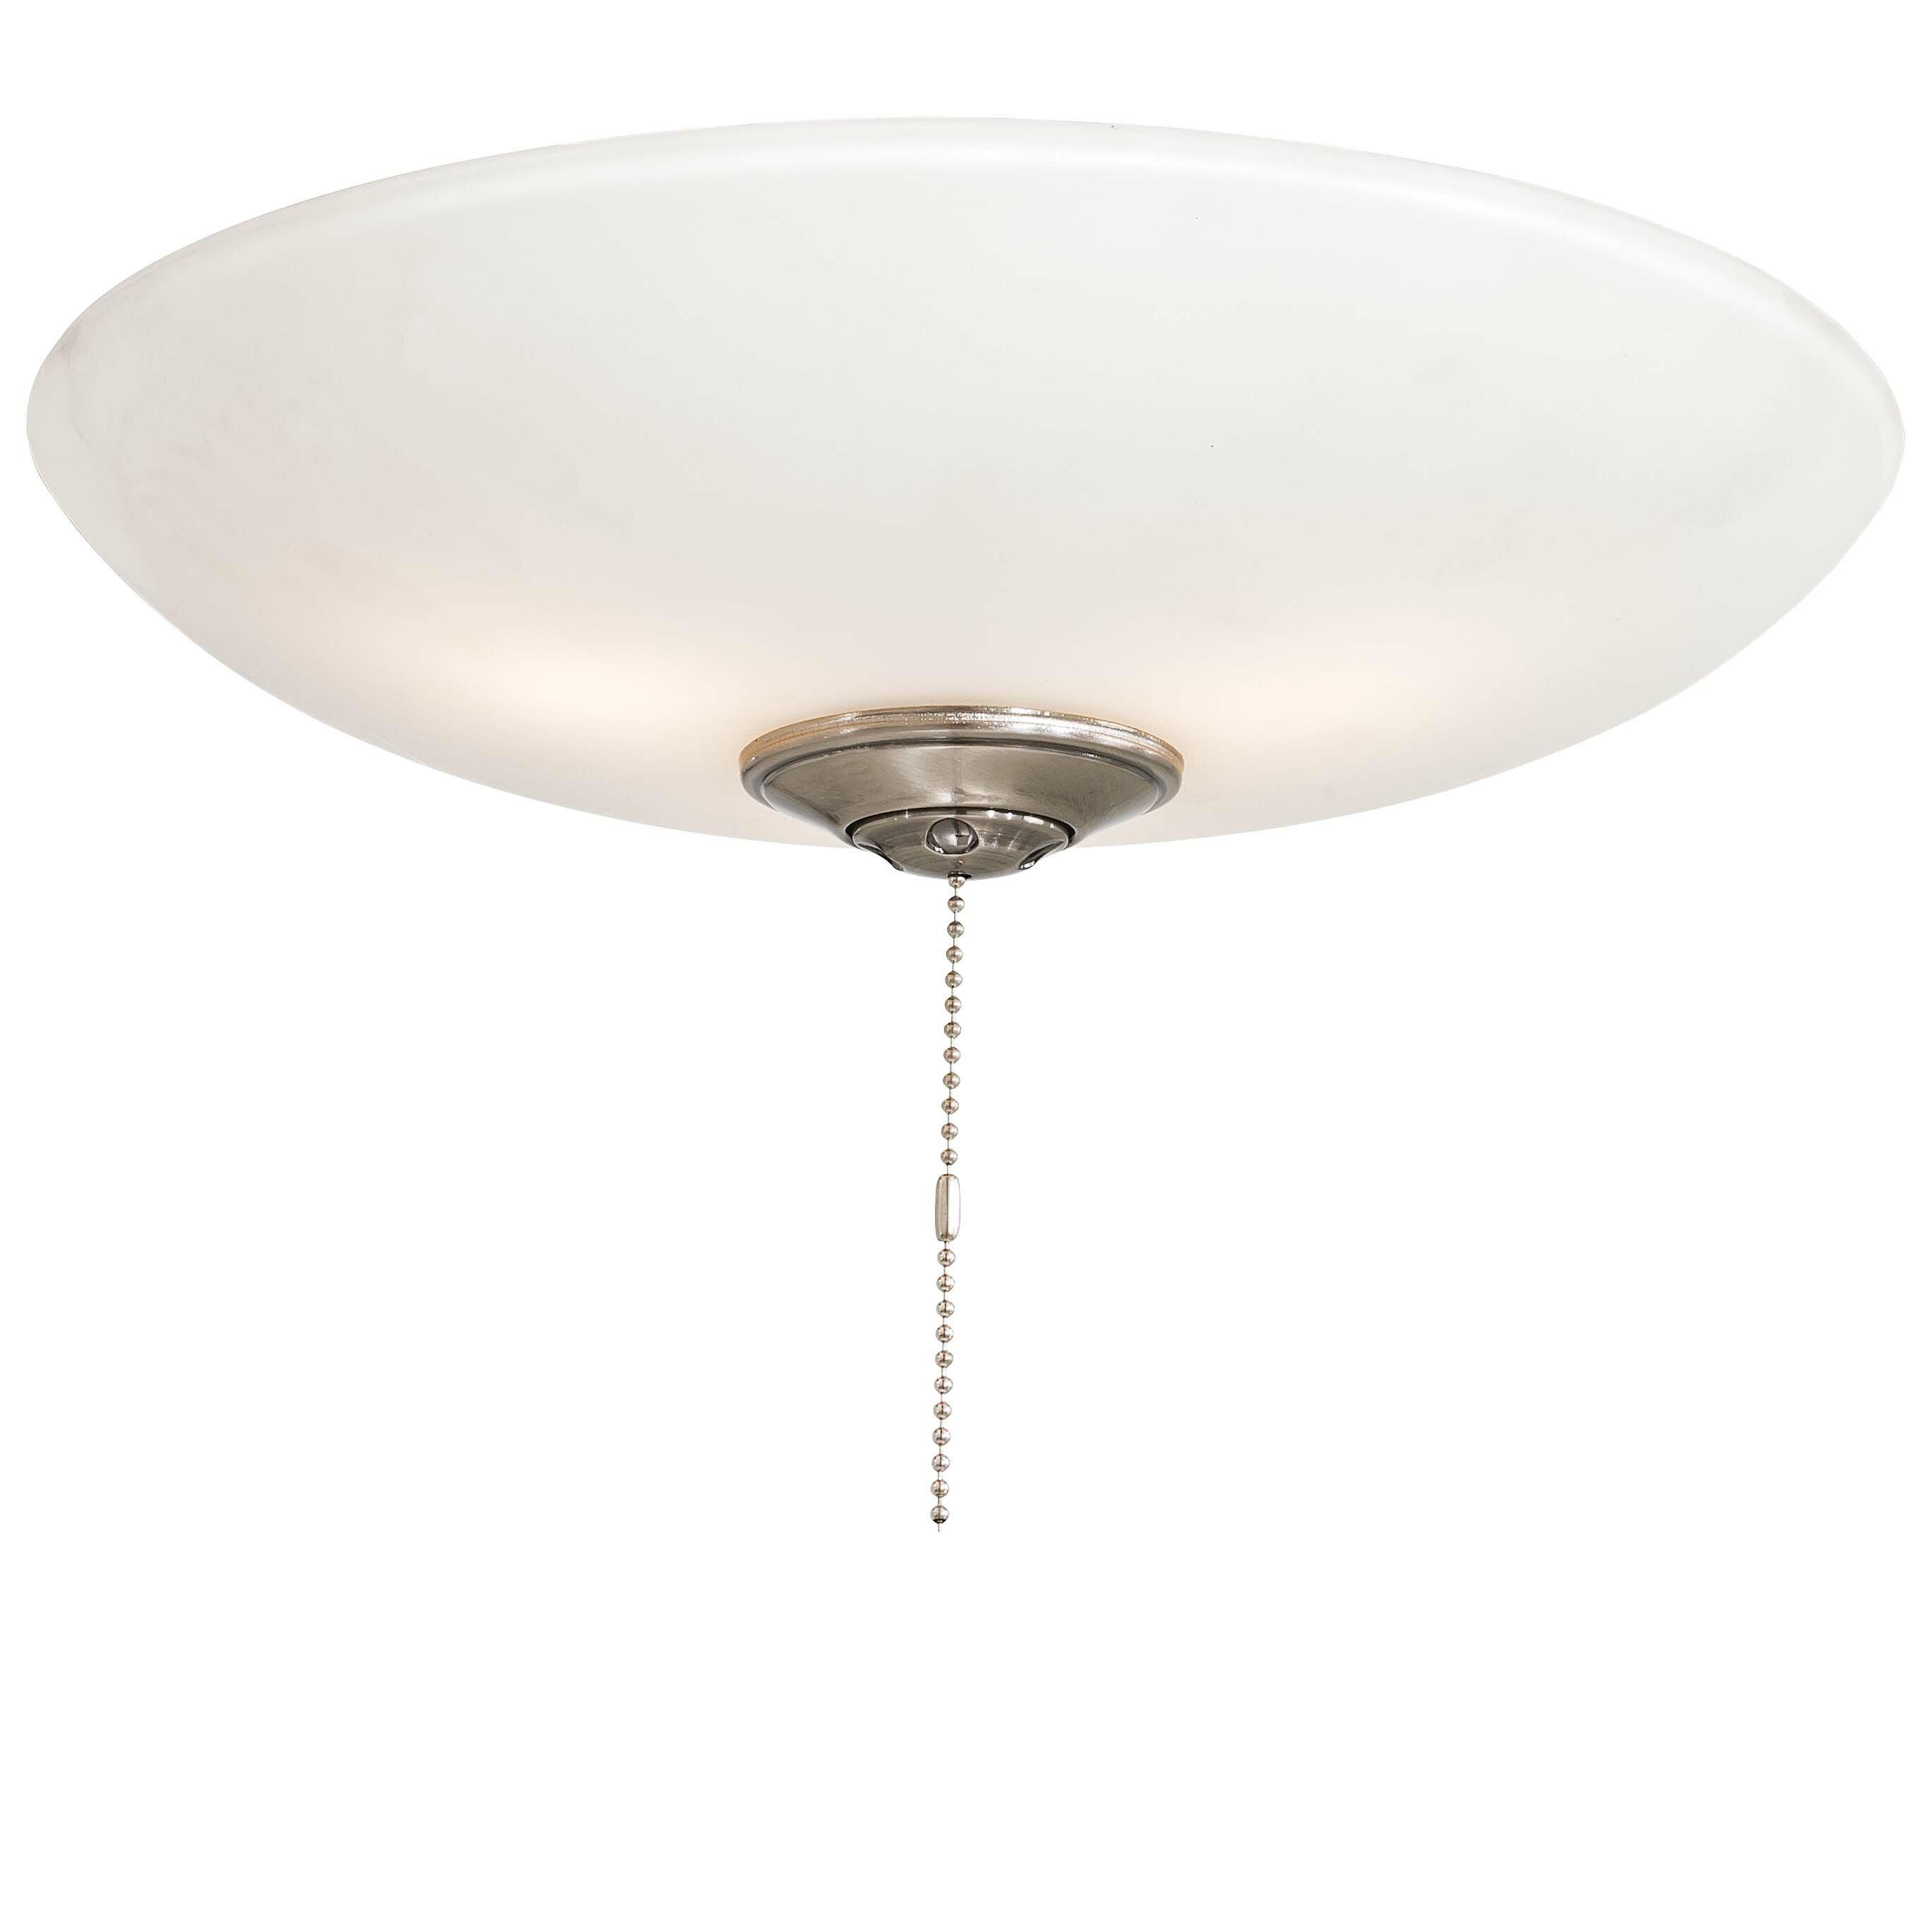 aire universal 3 light bowl ceiling fan light kit reviews wayfair. Black Bedroom Furniture Sets. Home Design Ideas